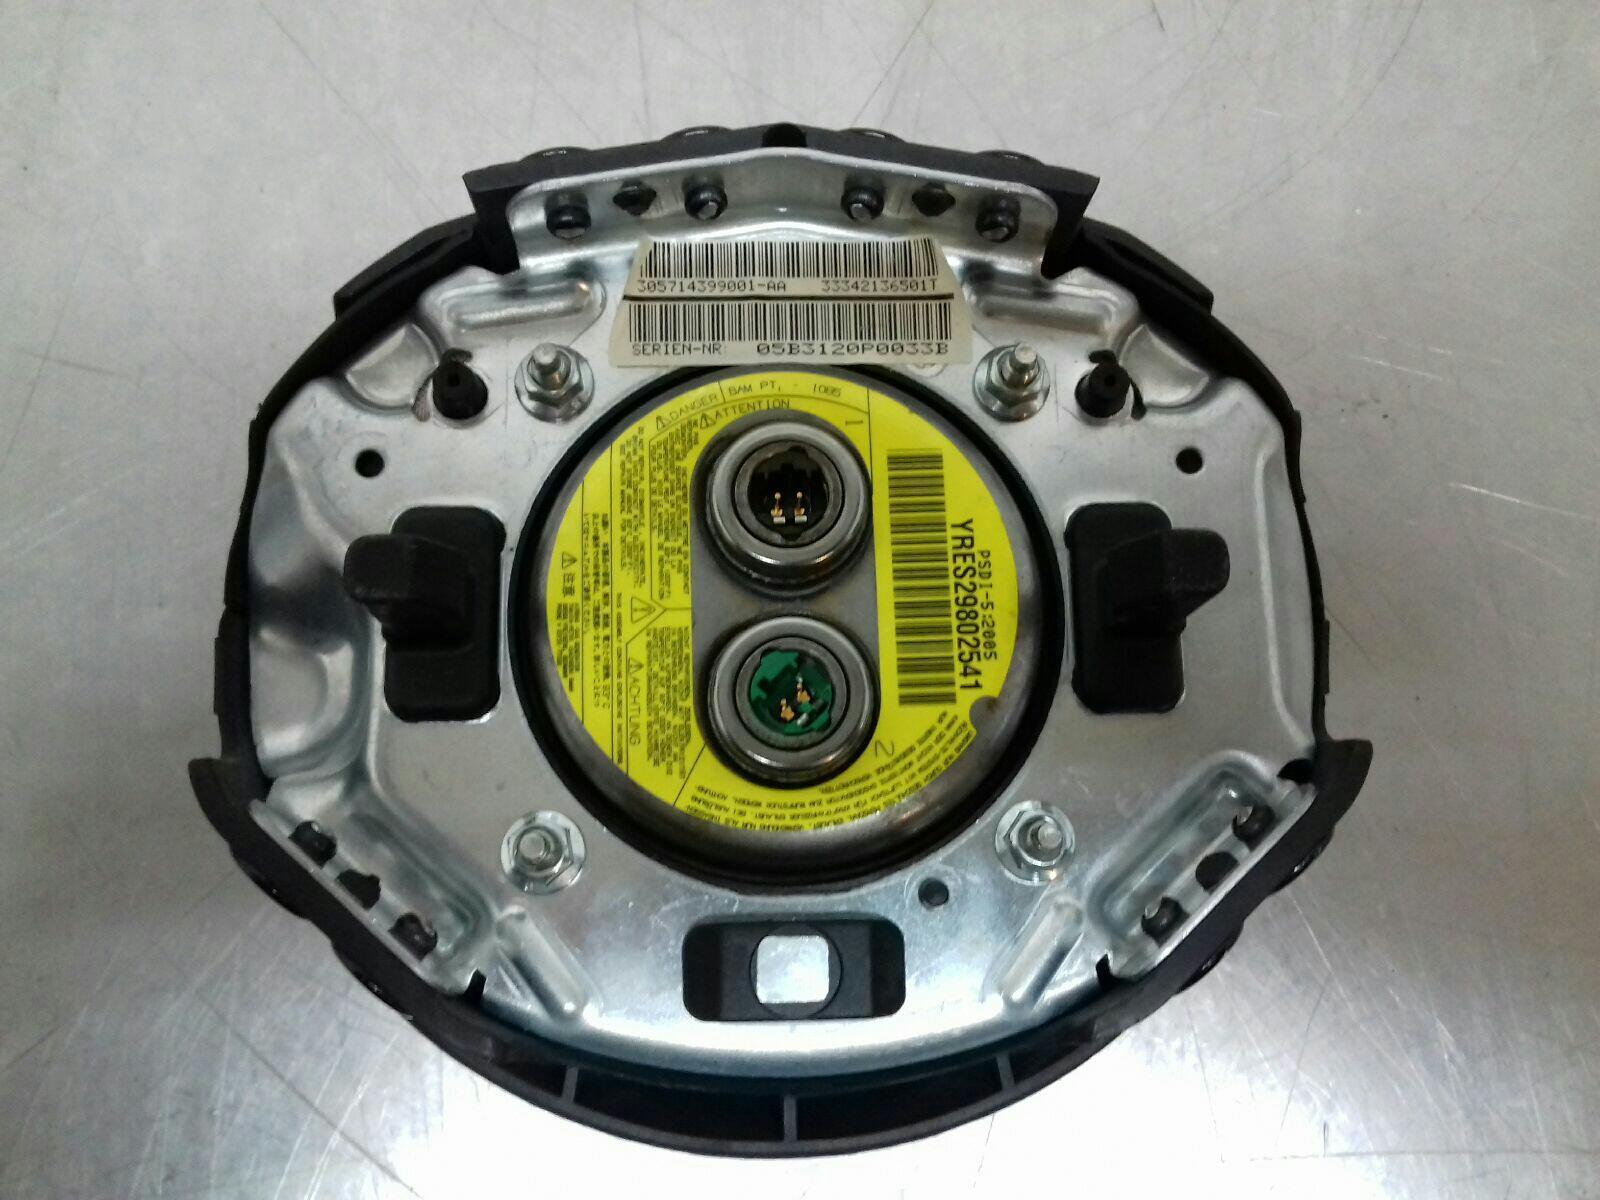 BMW X3 E83 Drivers Steering Wheel Airbag 32303438649